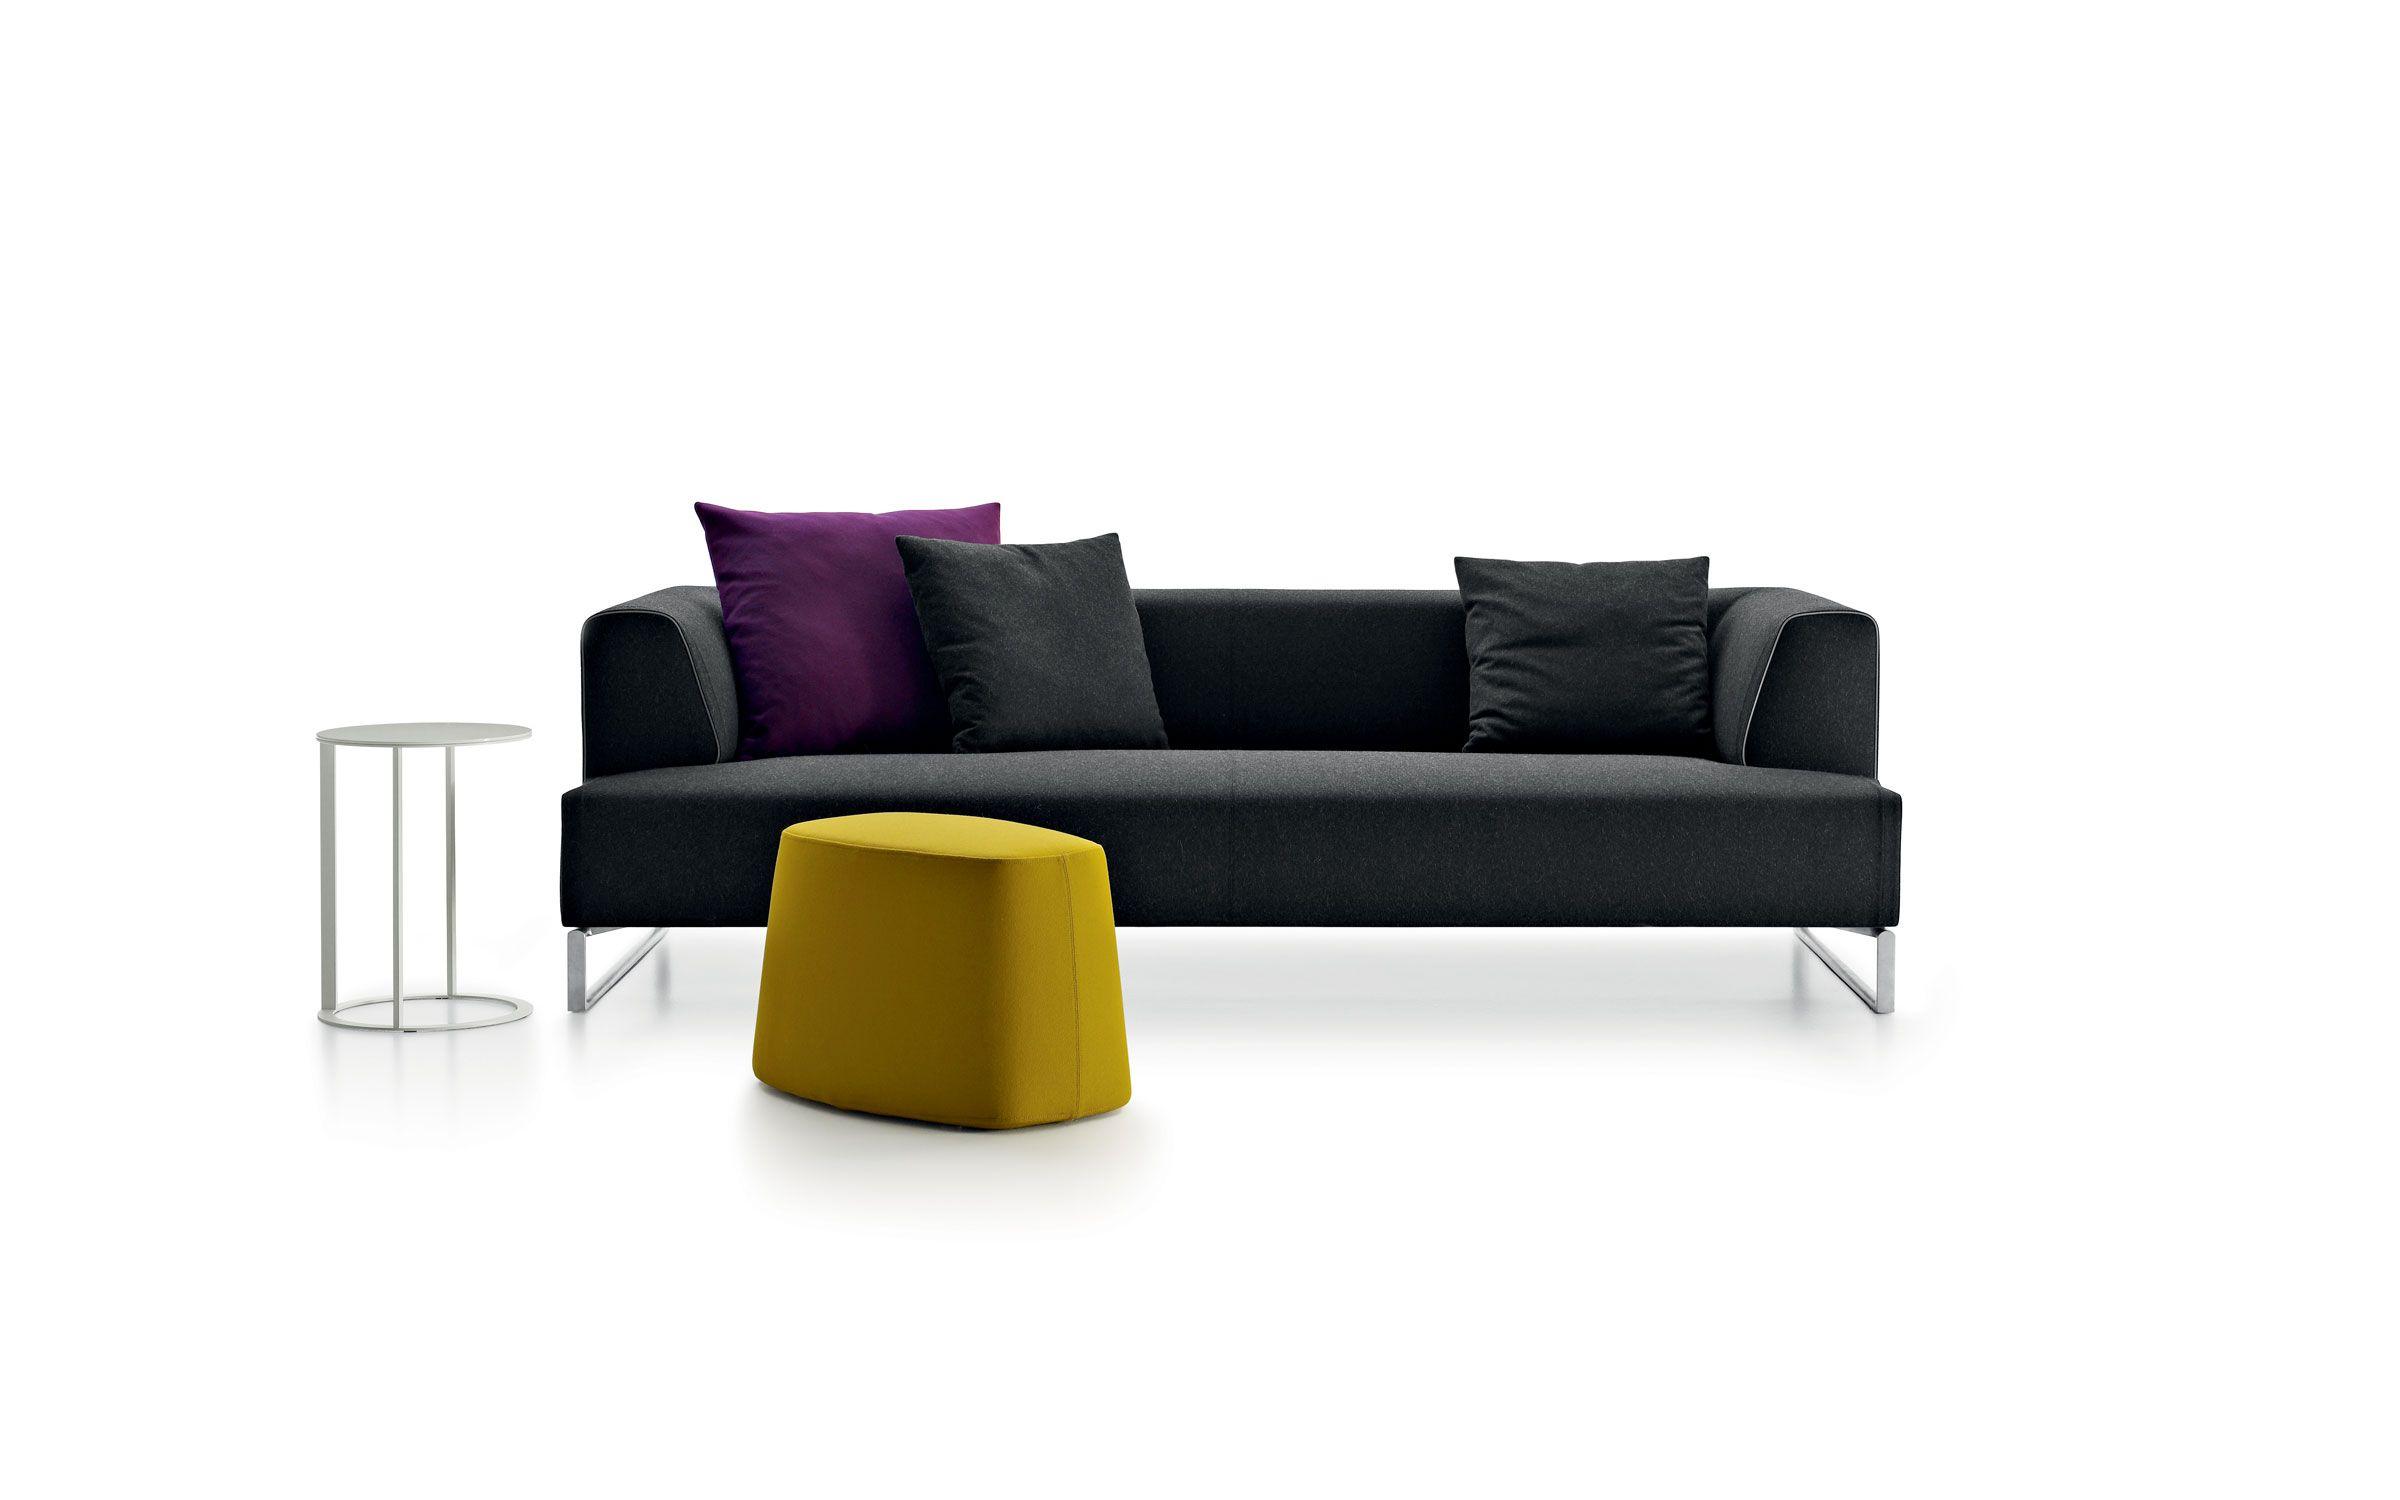 Mobili Viola ~ Solo 14 design by antonio citterio #bebitalia #antoniocitterio